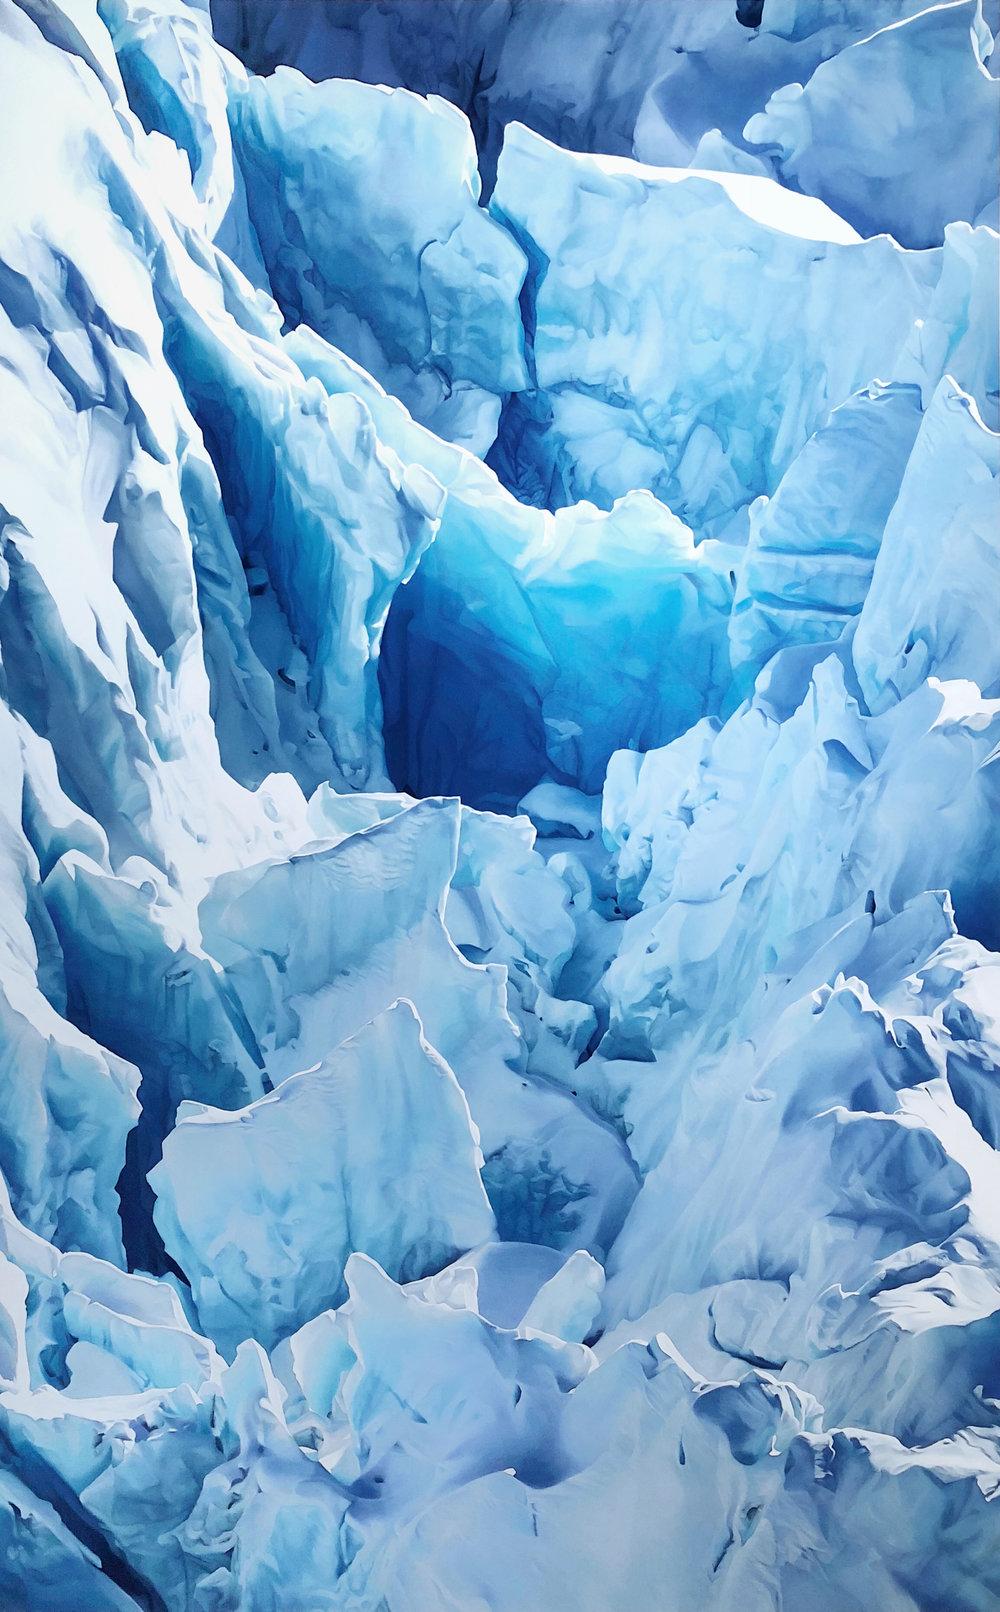 "Jakobshavn Glacier, Greenland, 69° 4'51.58""N 49°28'24.41""W, April 29th, 2017 , soft pastel on paper, 108 3/8 x 68 inches, 2018"